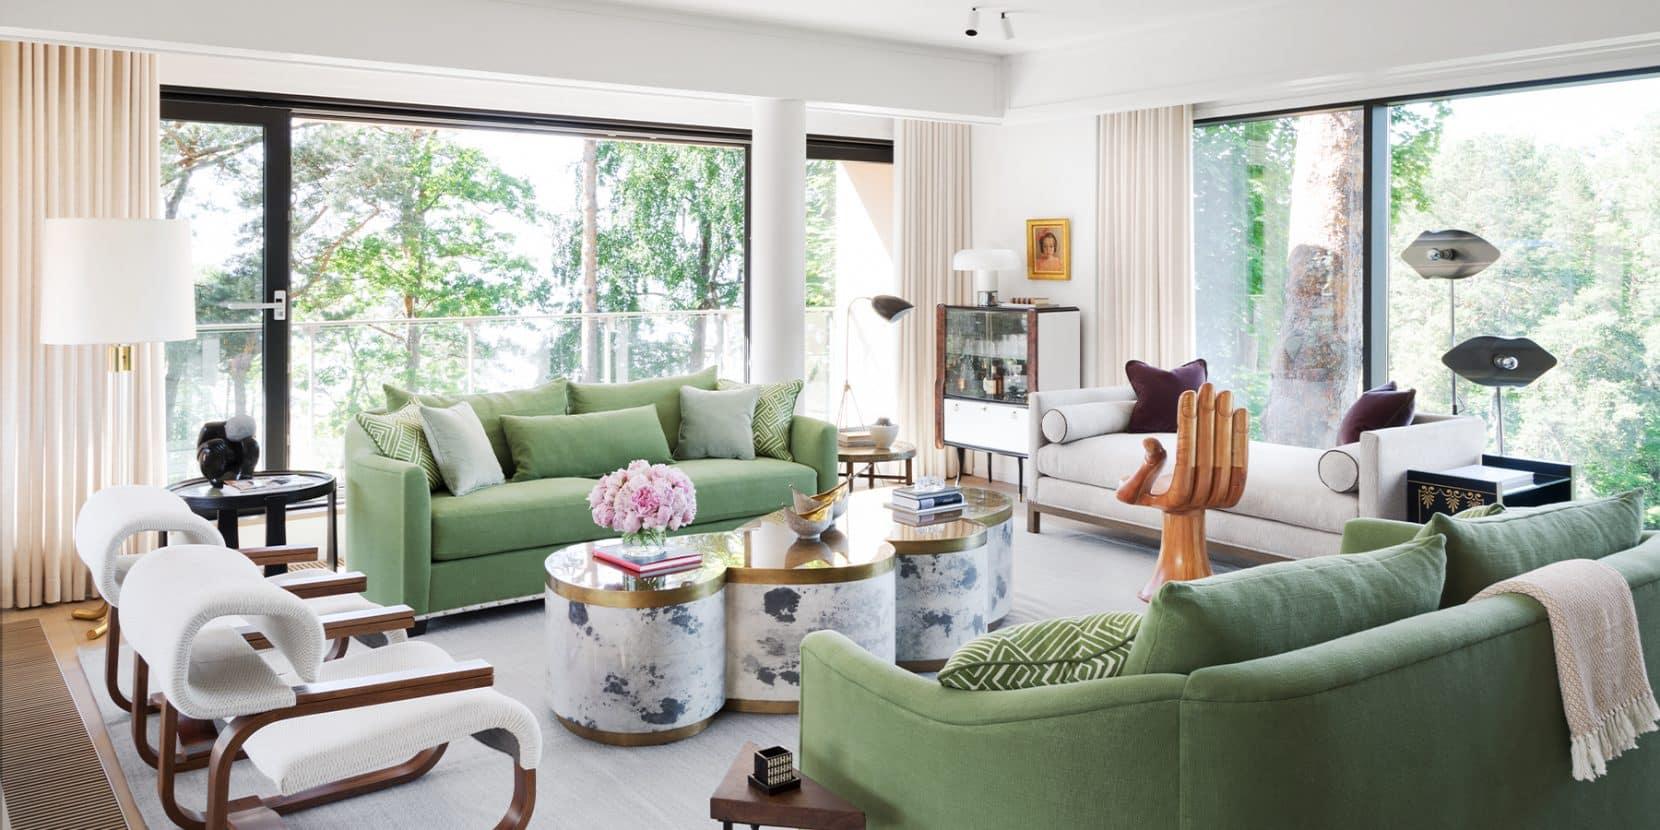 Interior designer Sergejs Ogurcovs SOG Interiors Saulkrasti beach resort Latvia living room